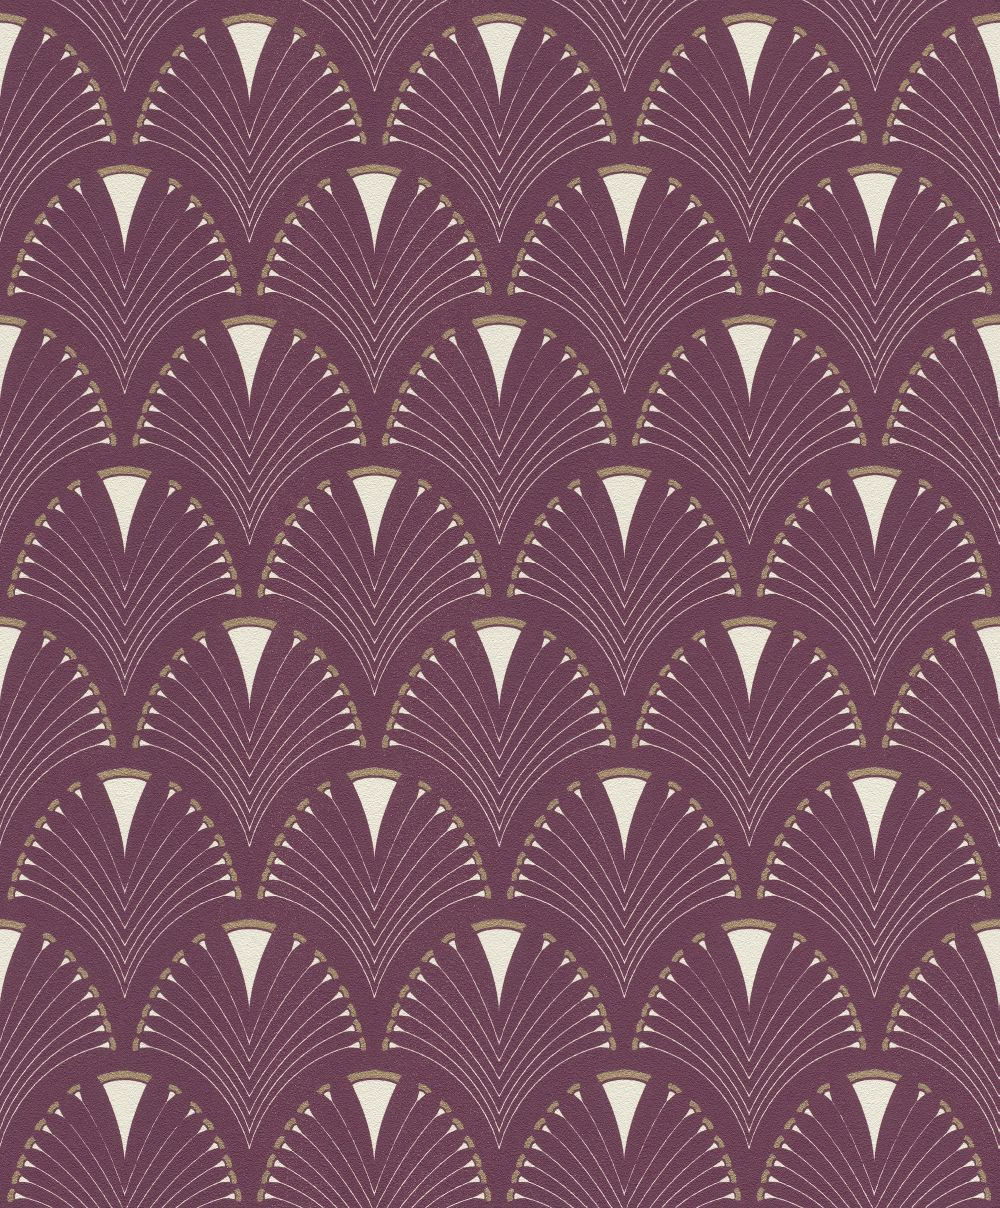 Albany Deco Arch Mauve Wallpaper - Product code: 433241